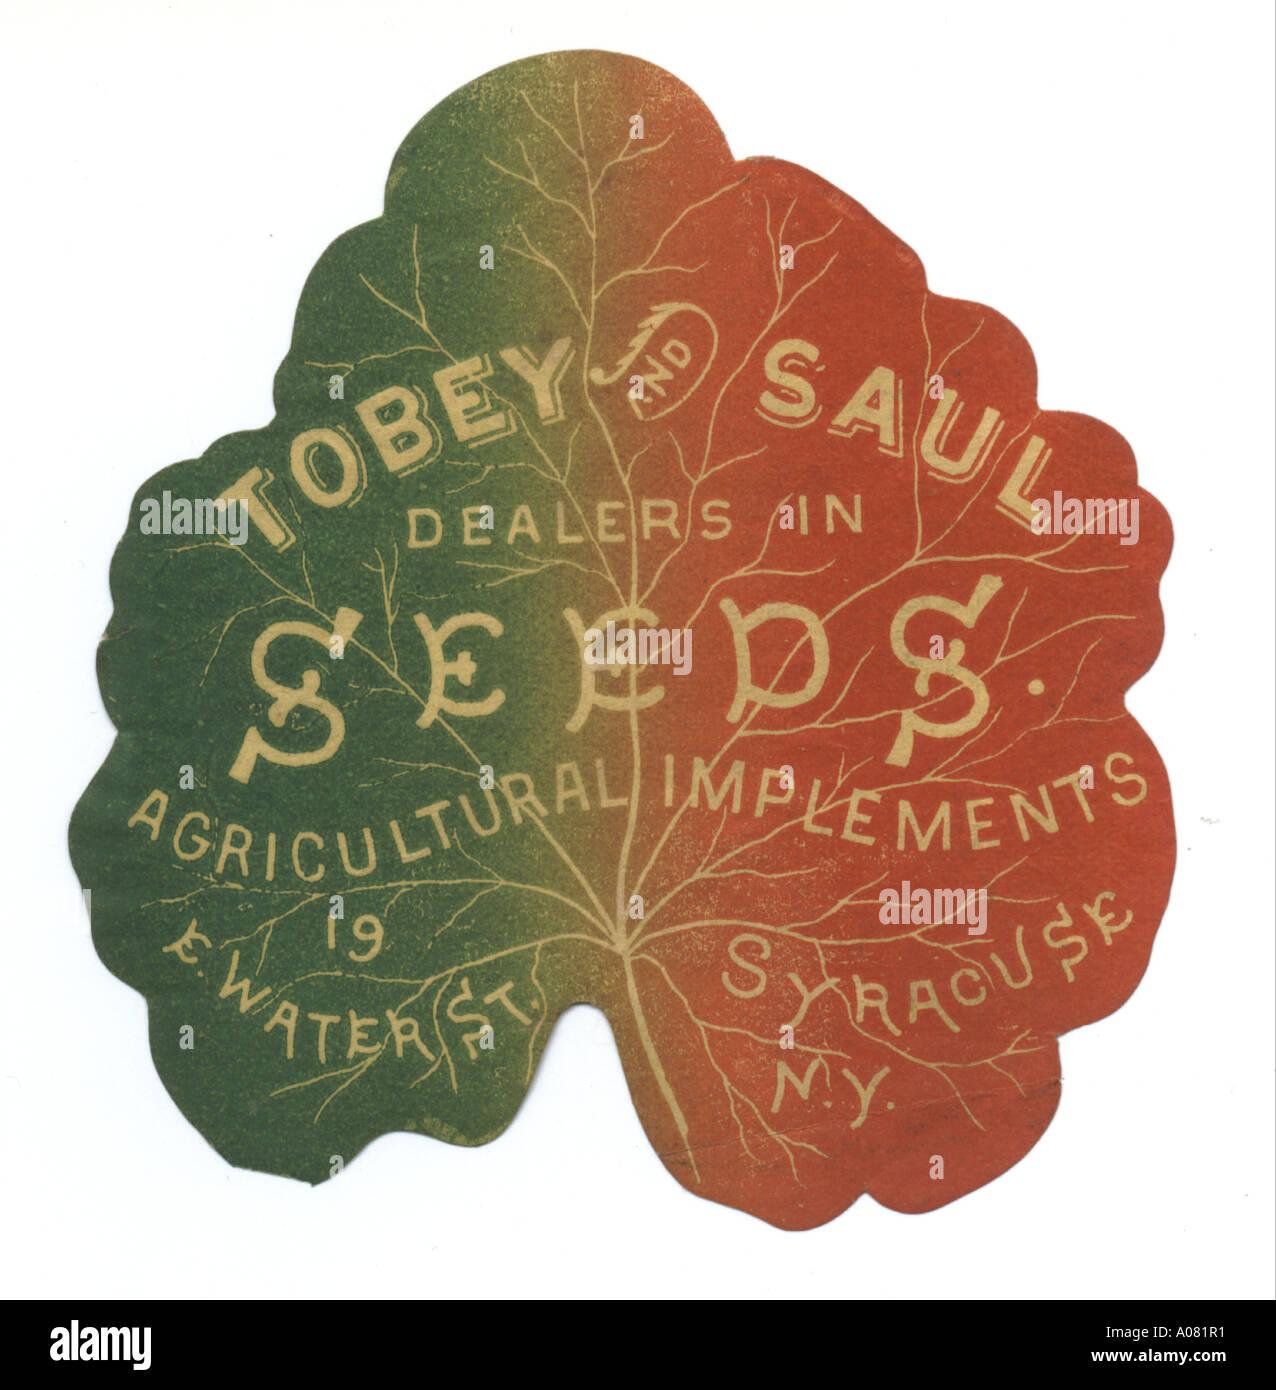 Tobey & Saul, seed merchants, trade card circa 1880 - Stock Image